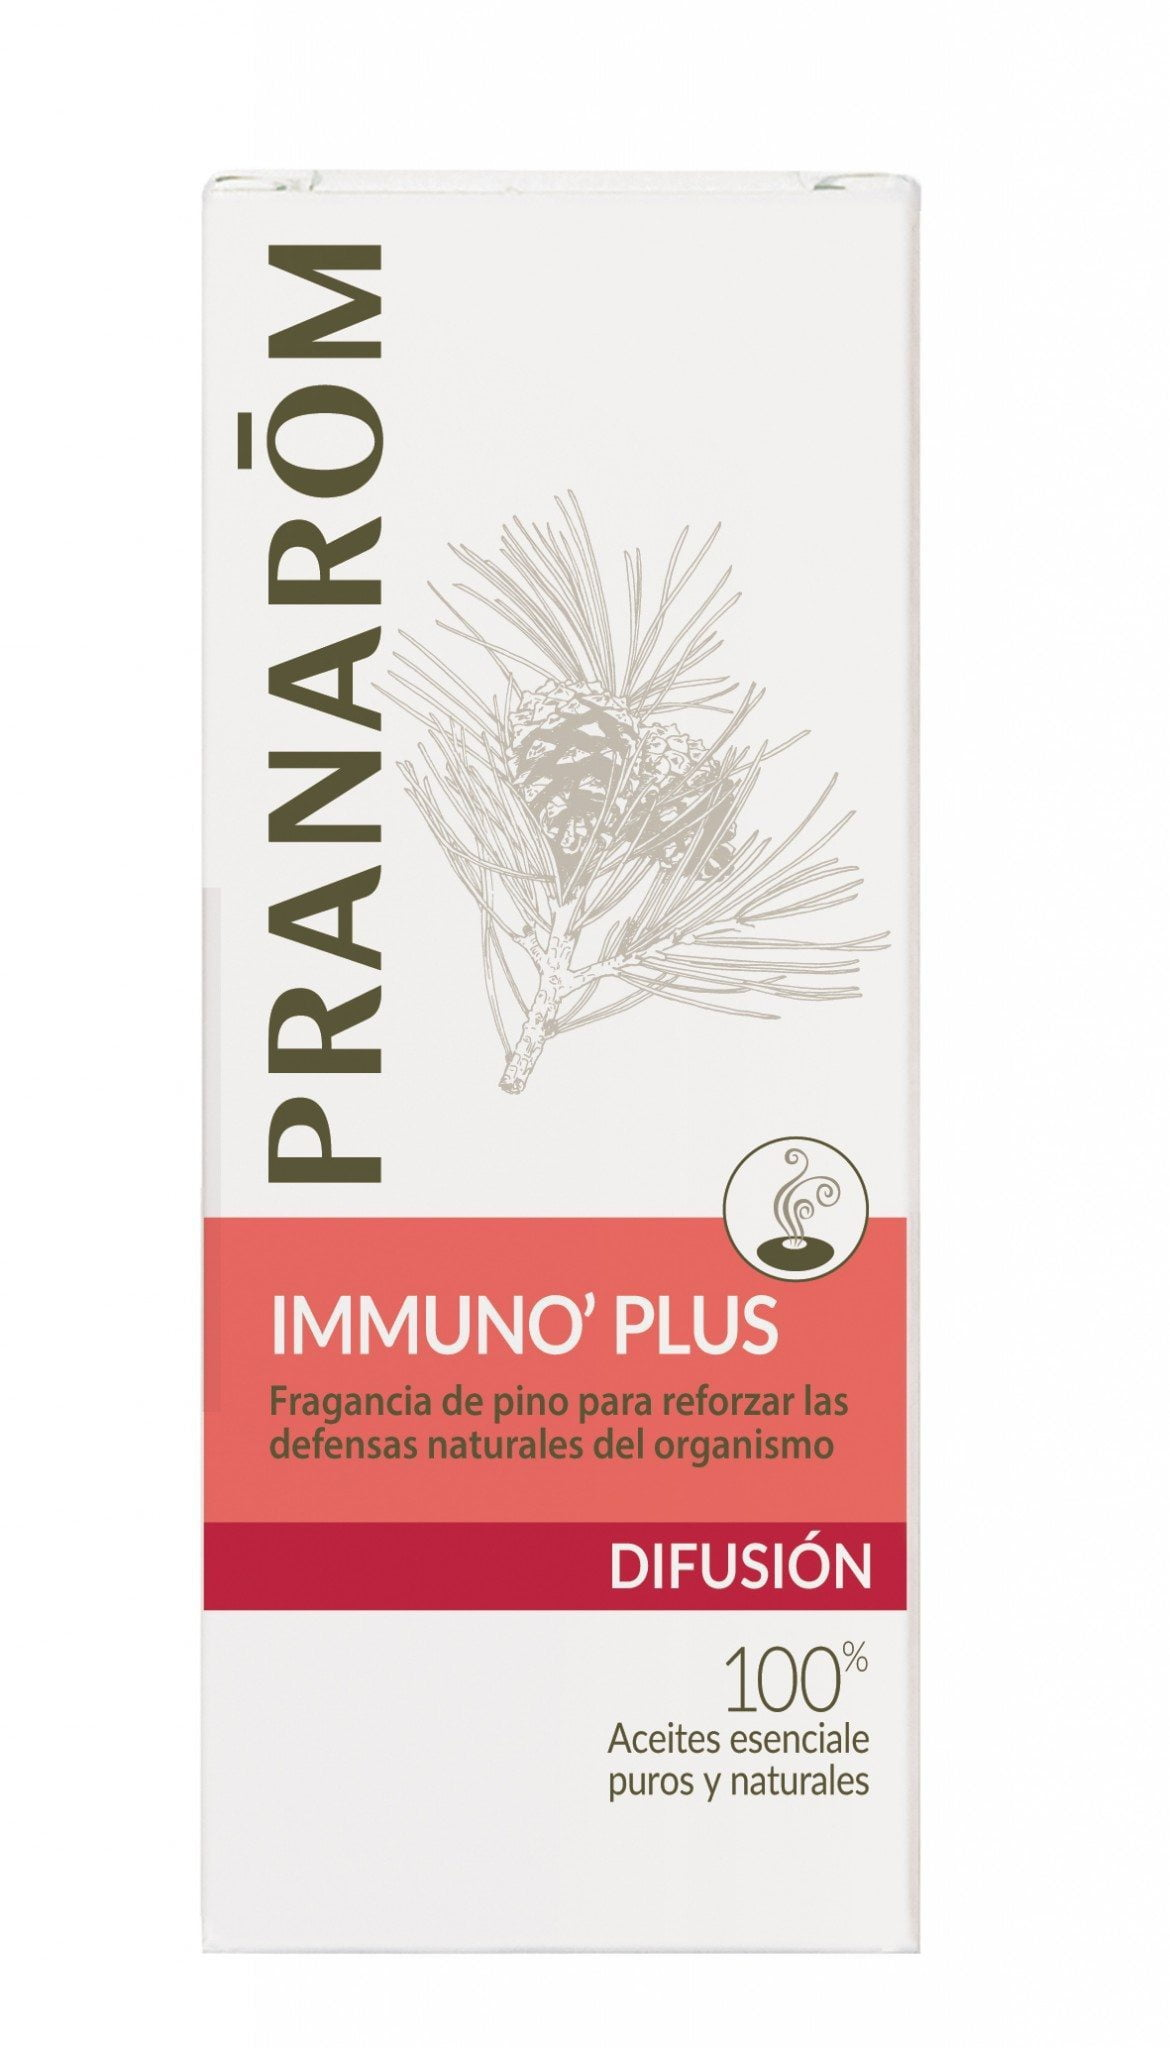 Aceites esenciales para prevenir contagios, de Pranarôm